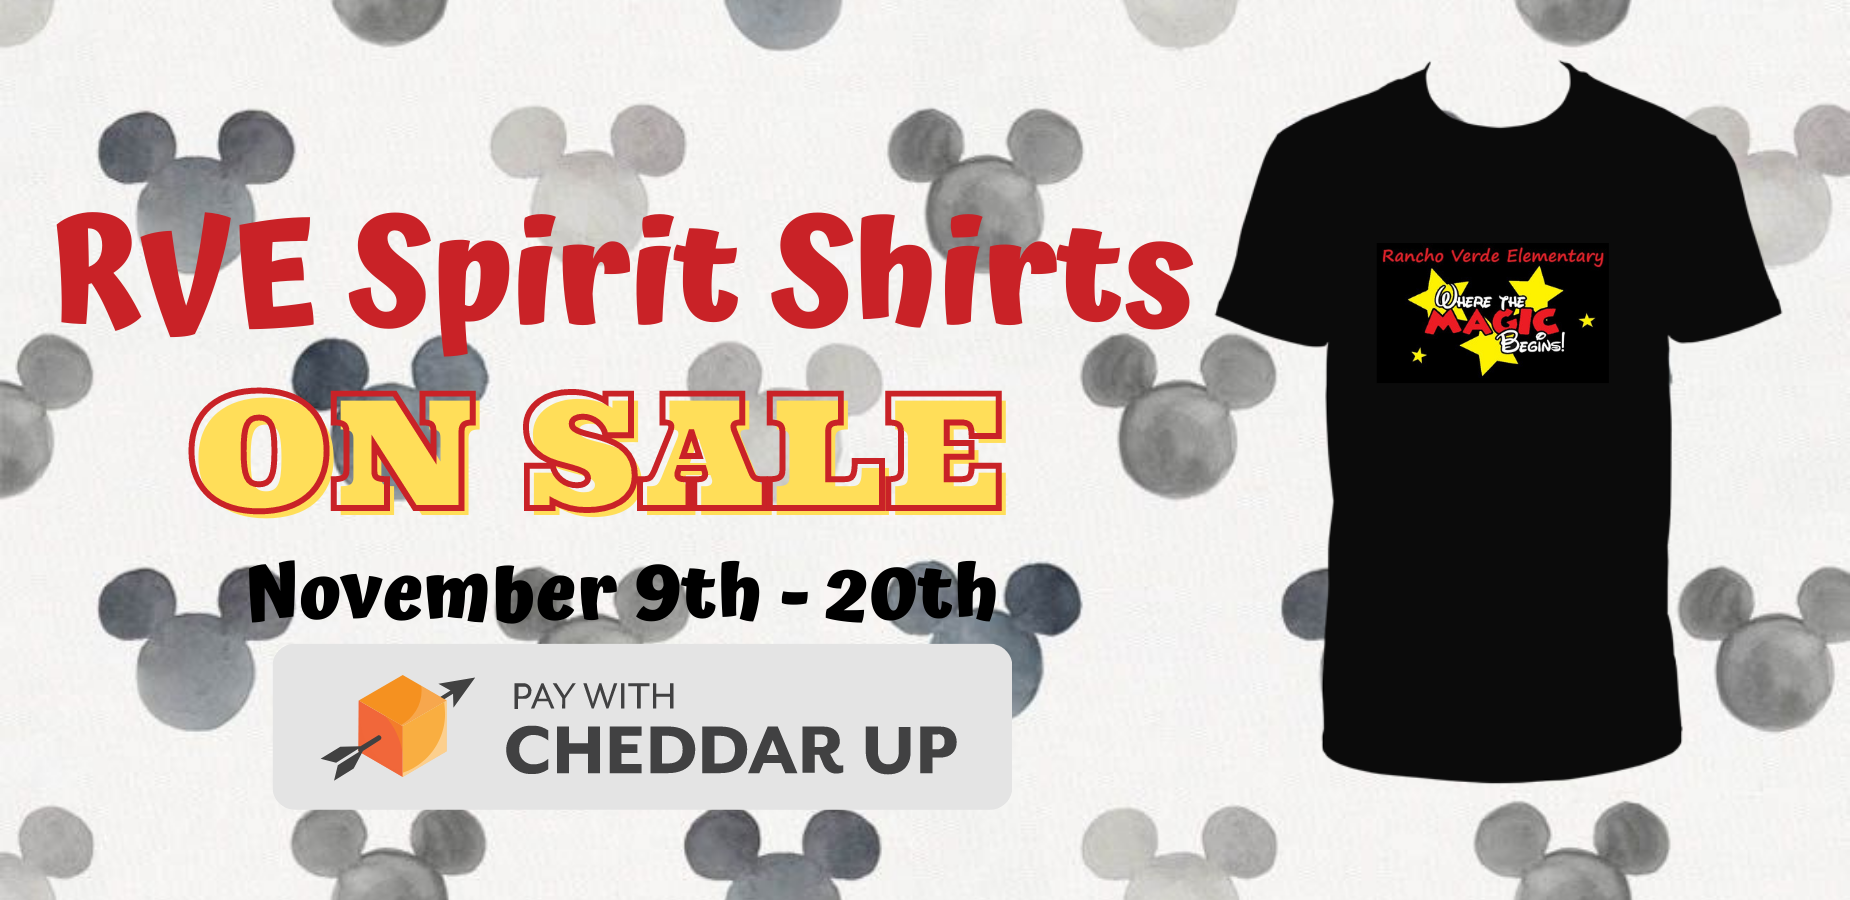 rve shirt sale